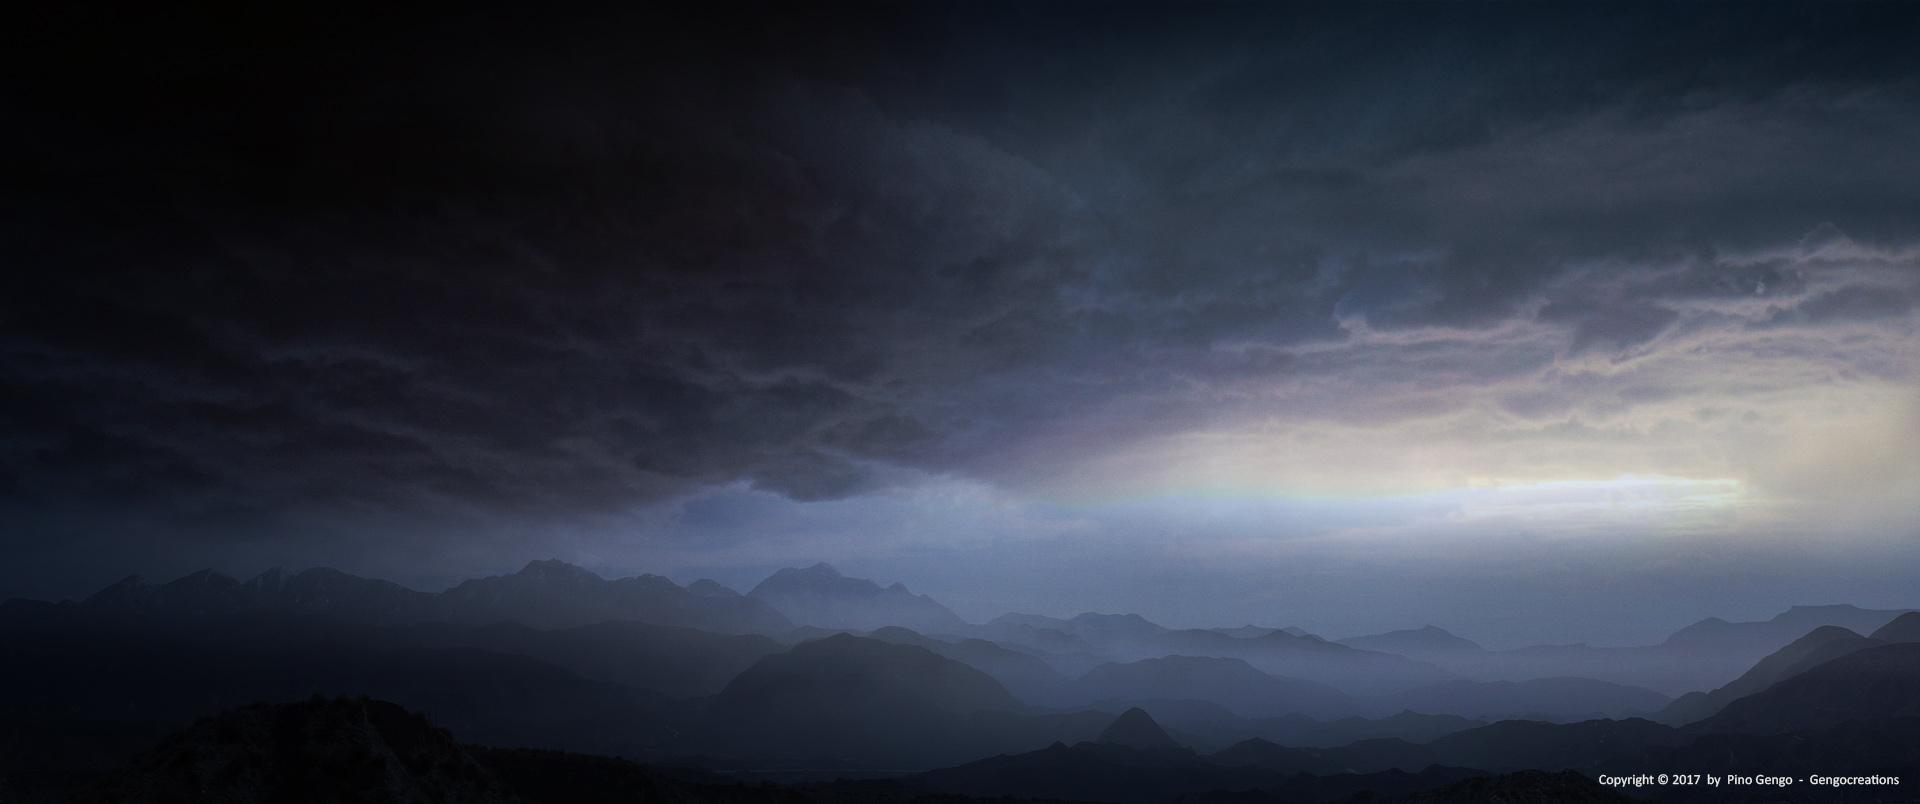 Pino Gengo: Stormy Landscape - Matte Painting